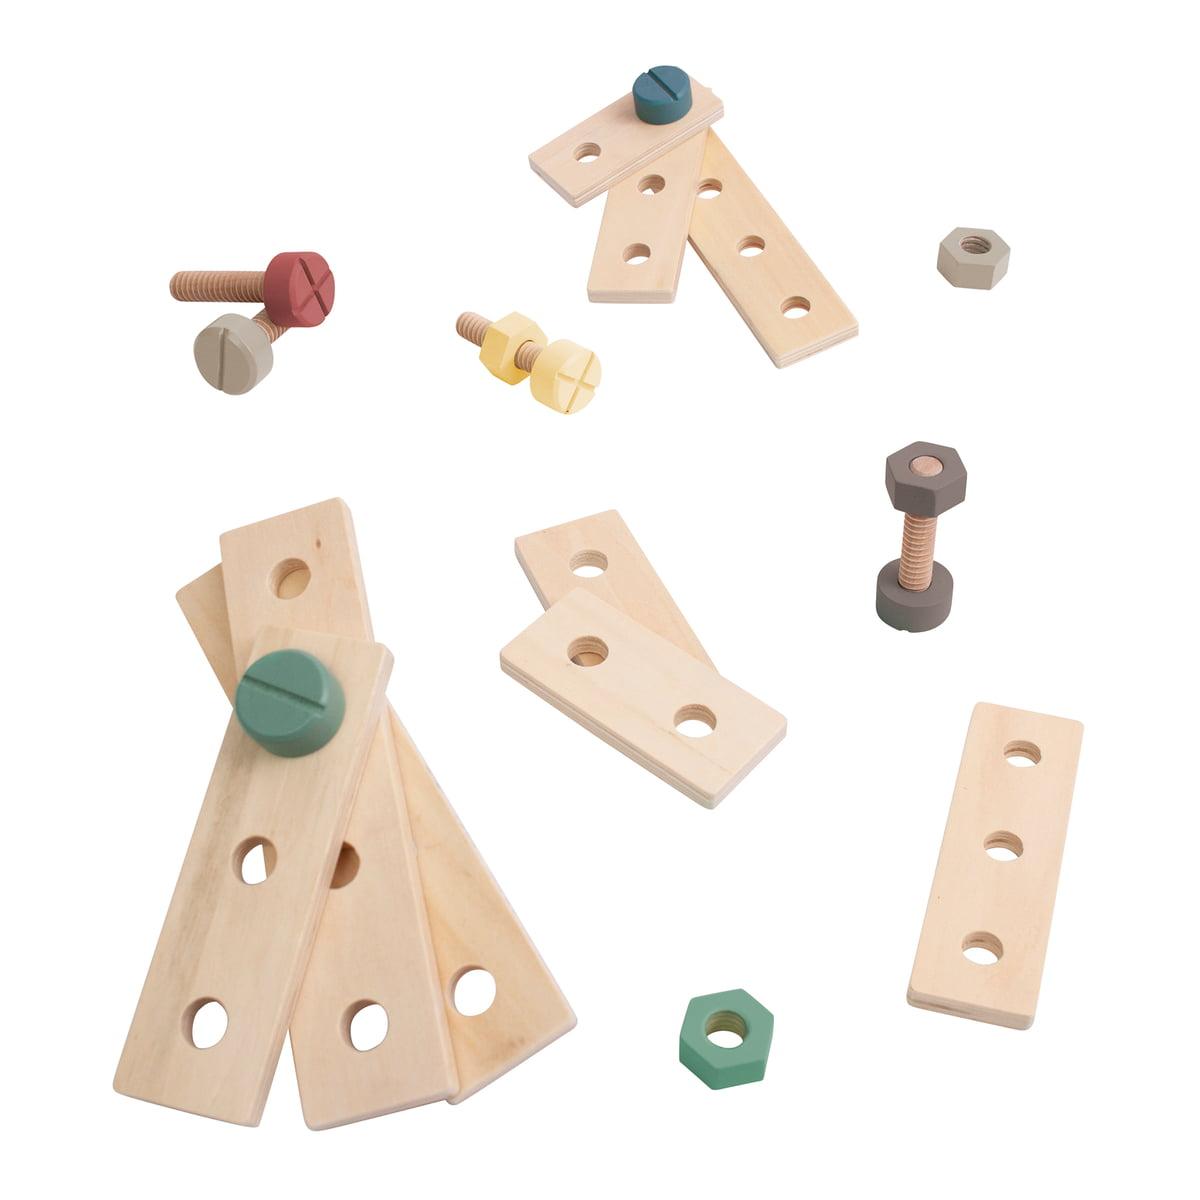 Sebra - Bau-Spielset, grau | Kinderzimmer > Spielzeuge > Sonstige Spielzeuge | Sebra